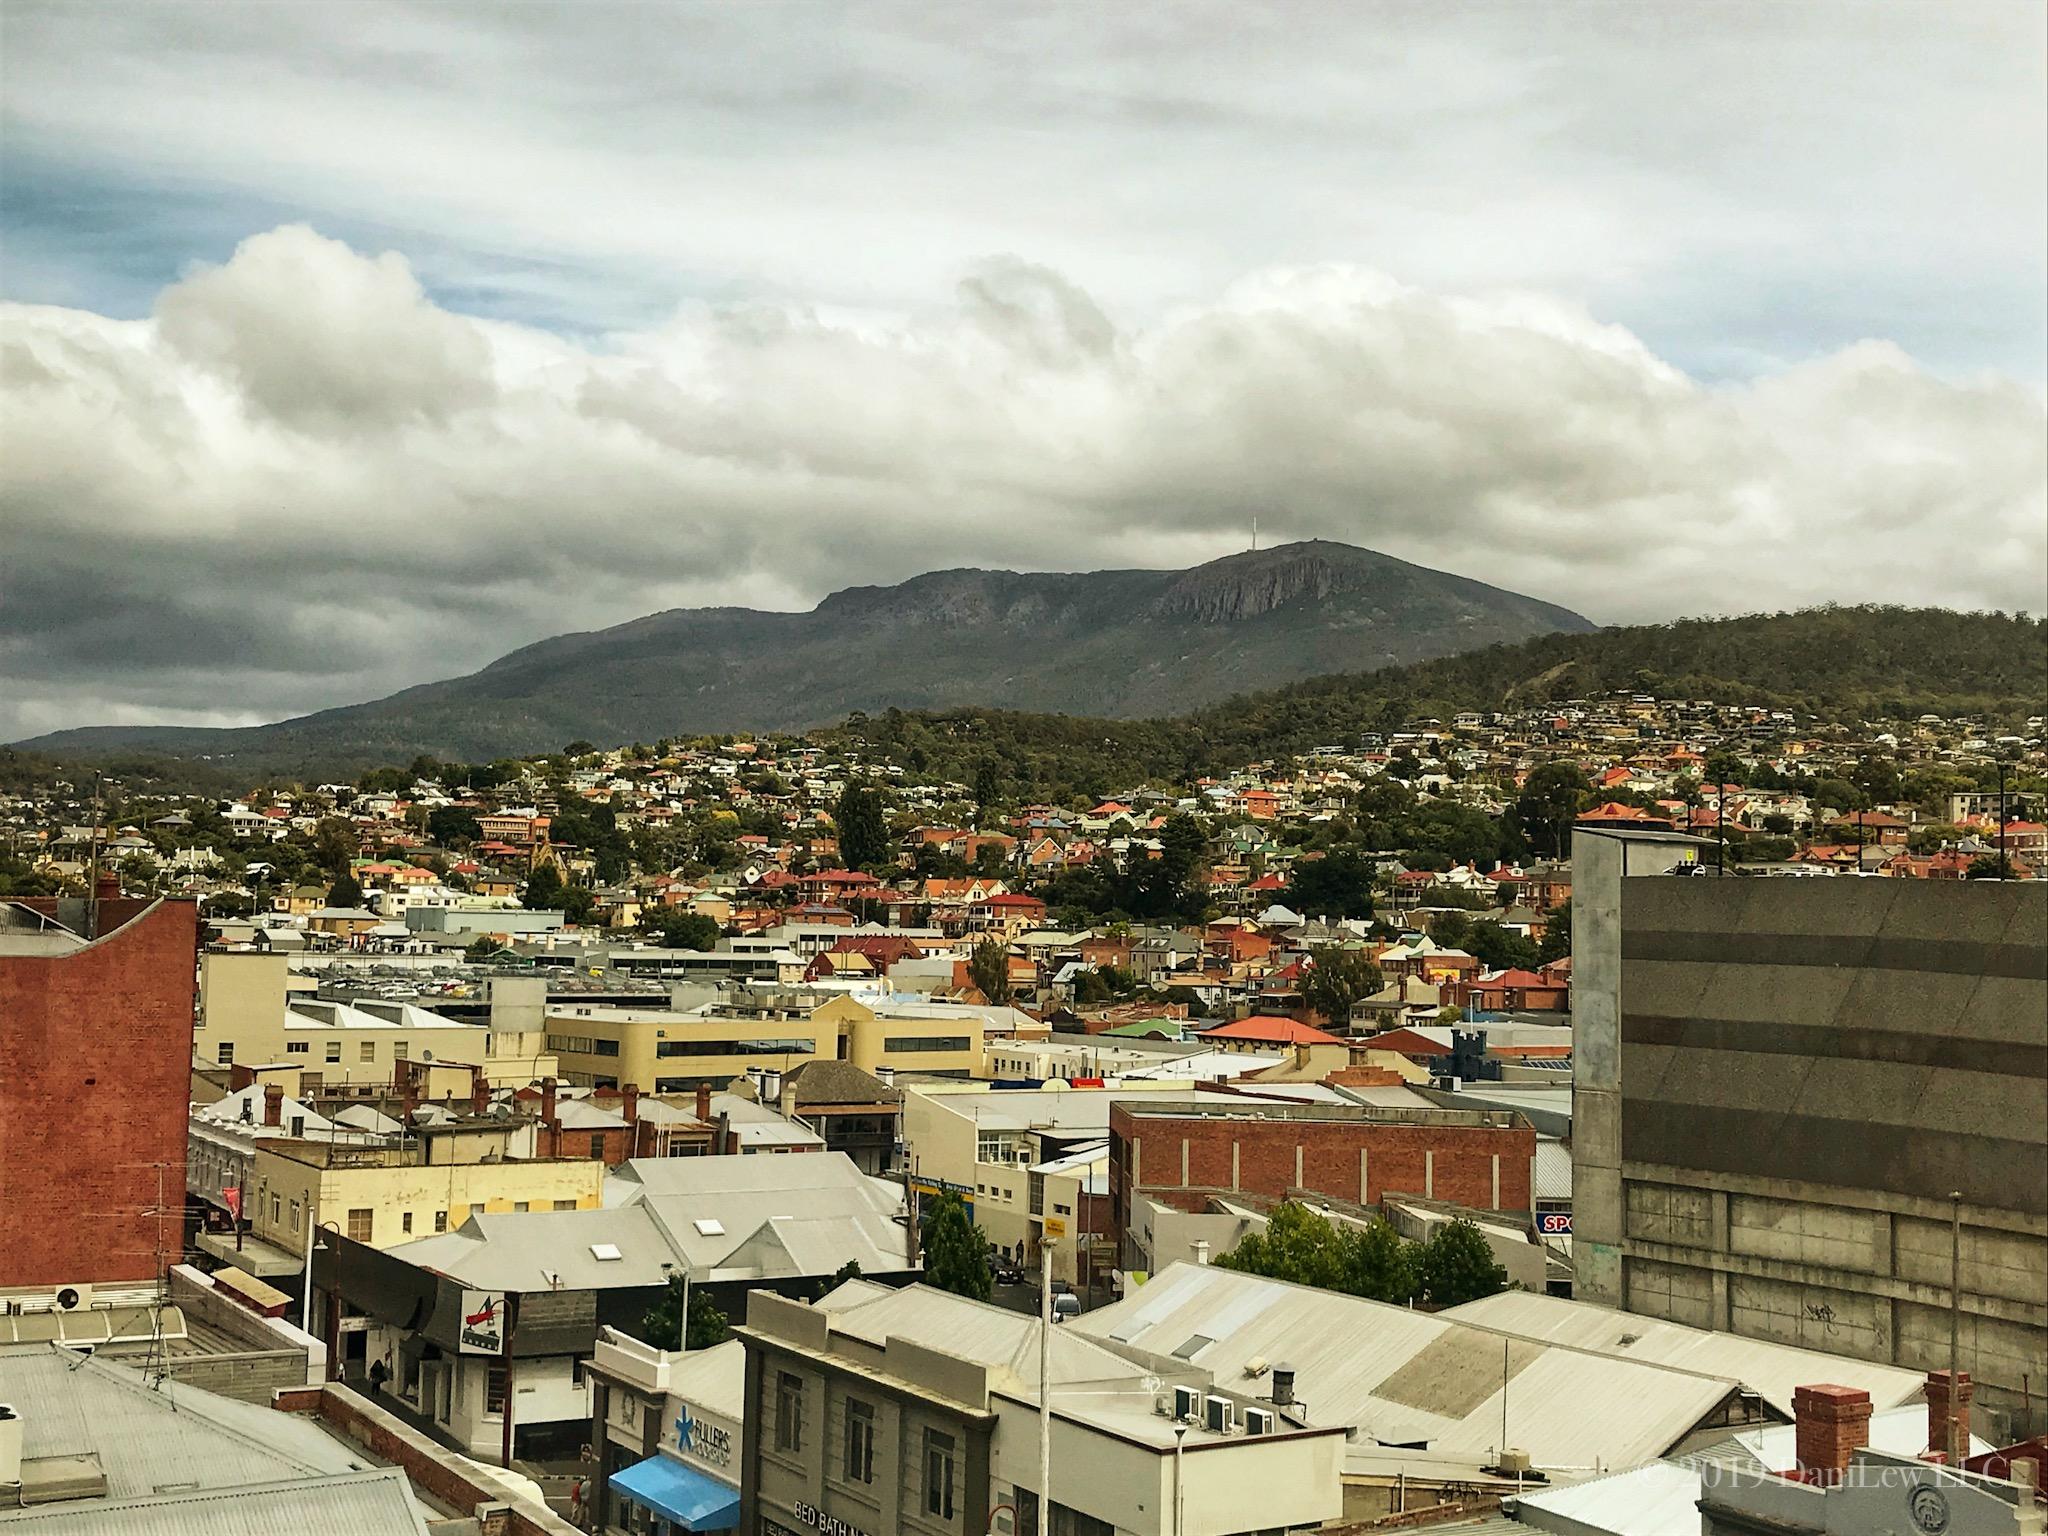 Two of my favorite iPhone pics of Hobart Tasmania Australia